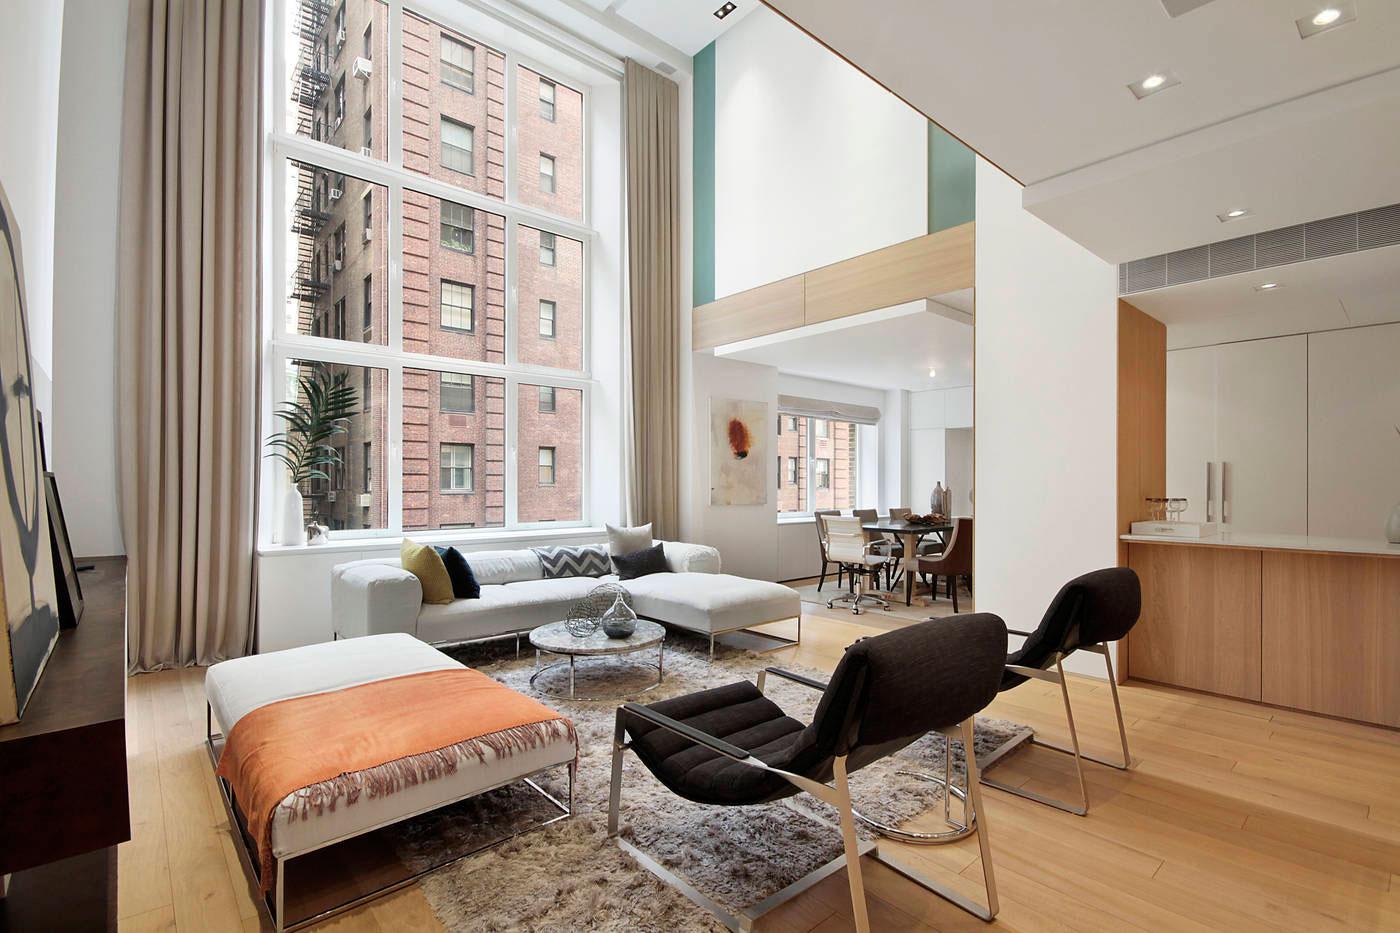 1916 Central Park West Apartment Remodeled by Workshop APD-02